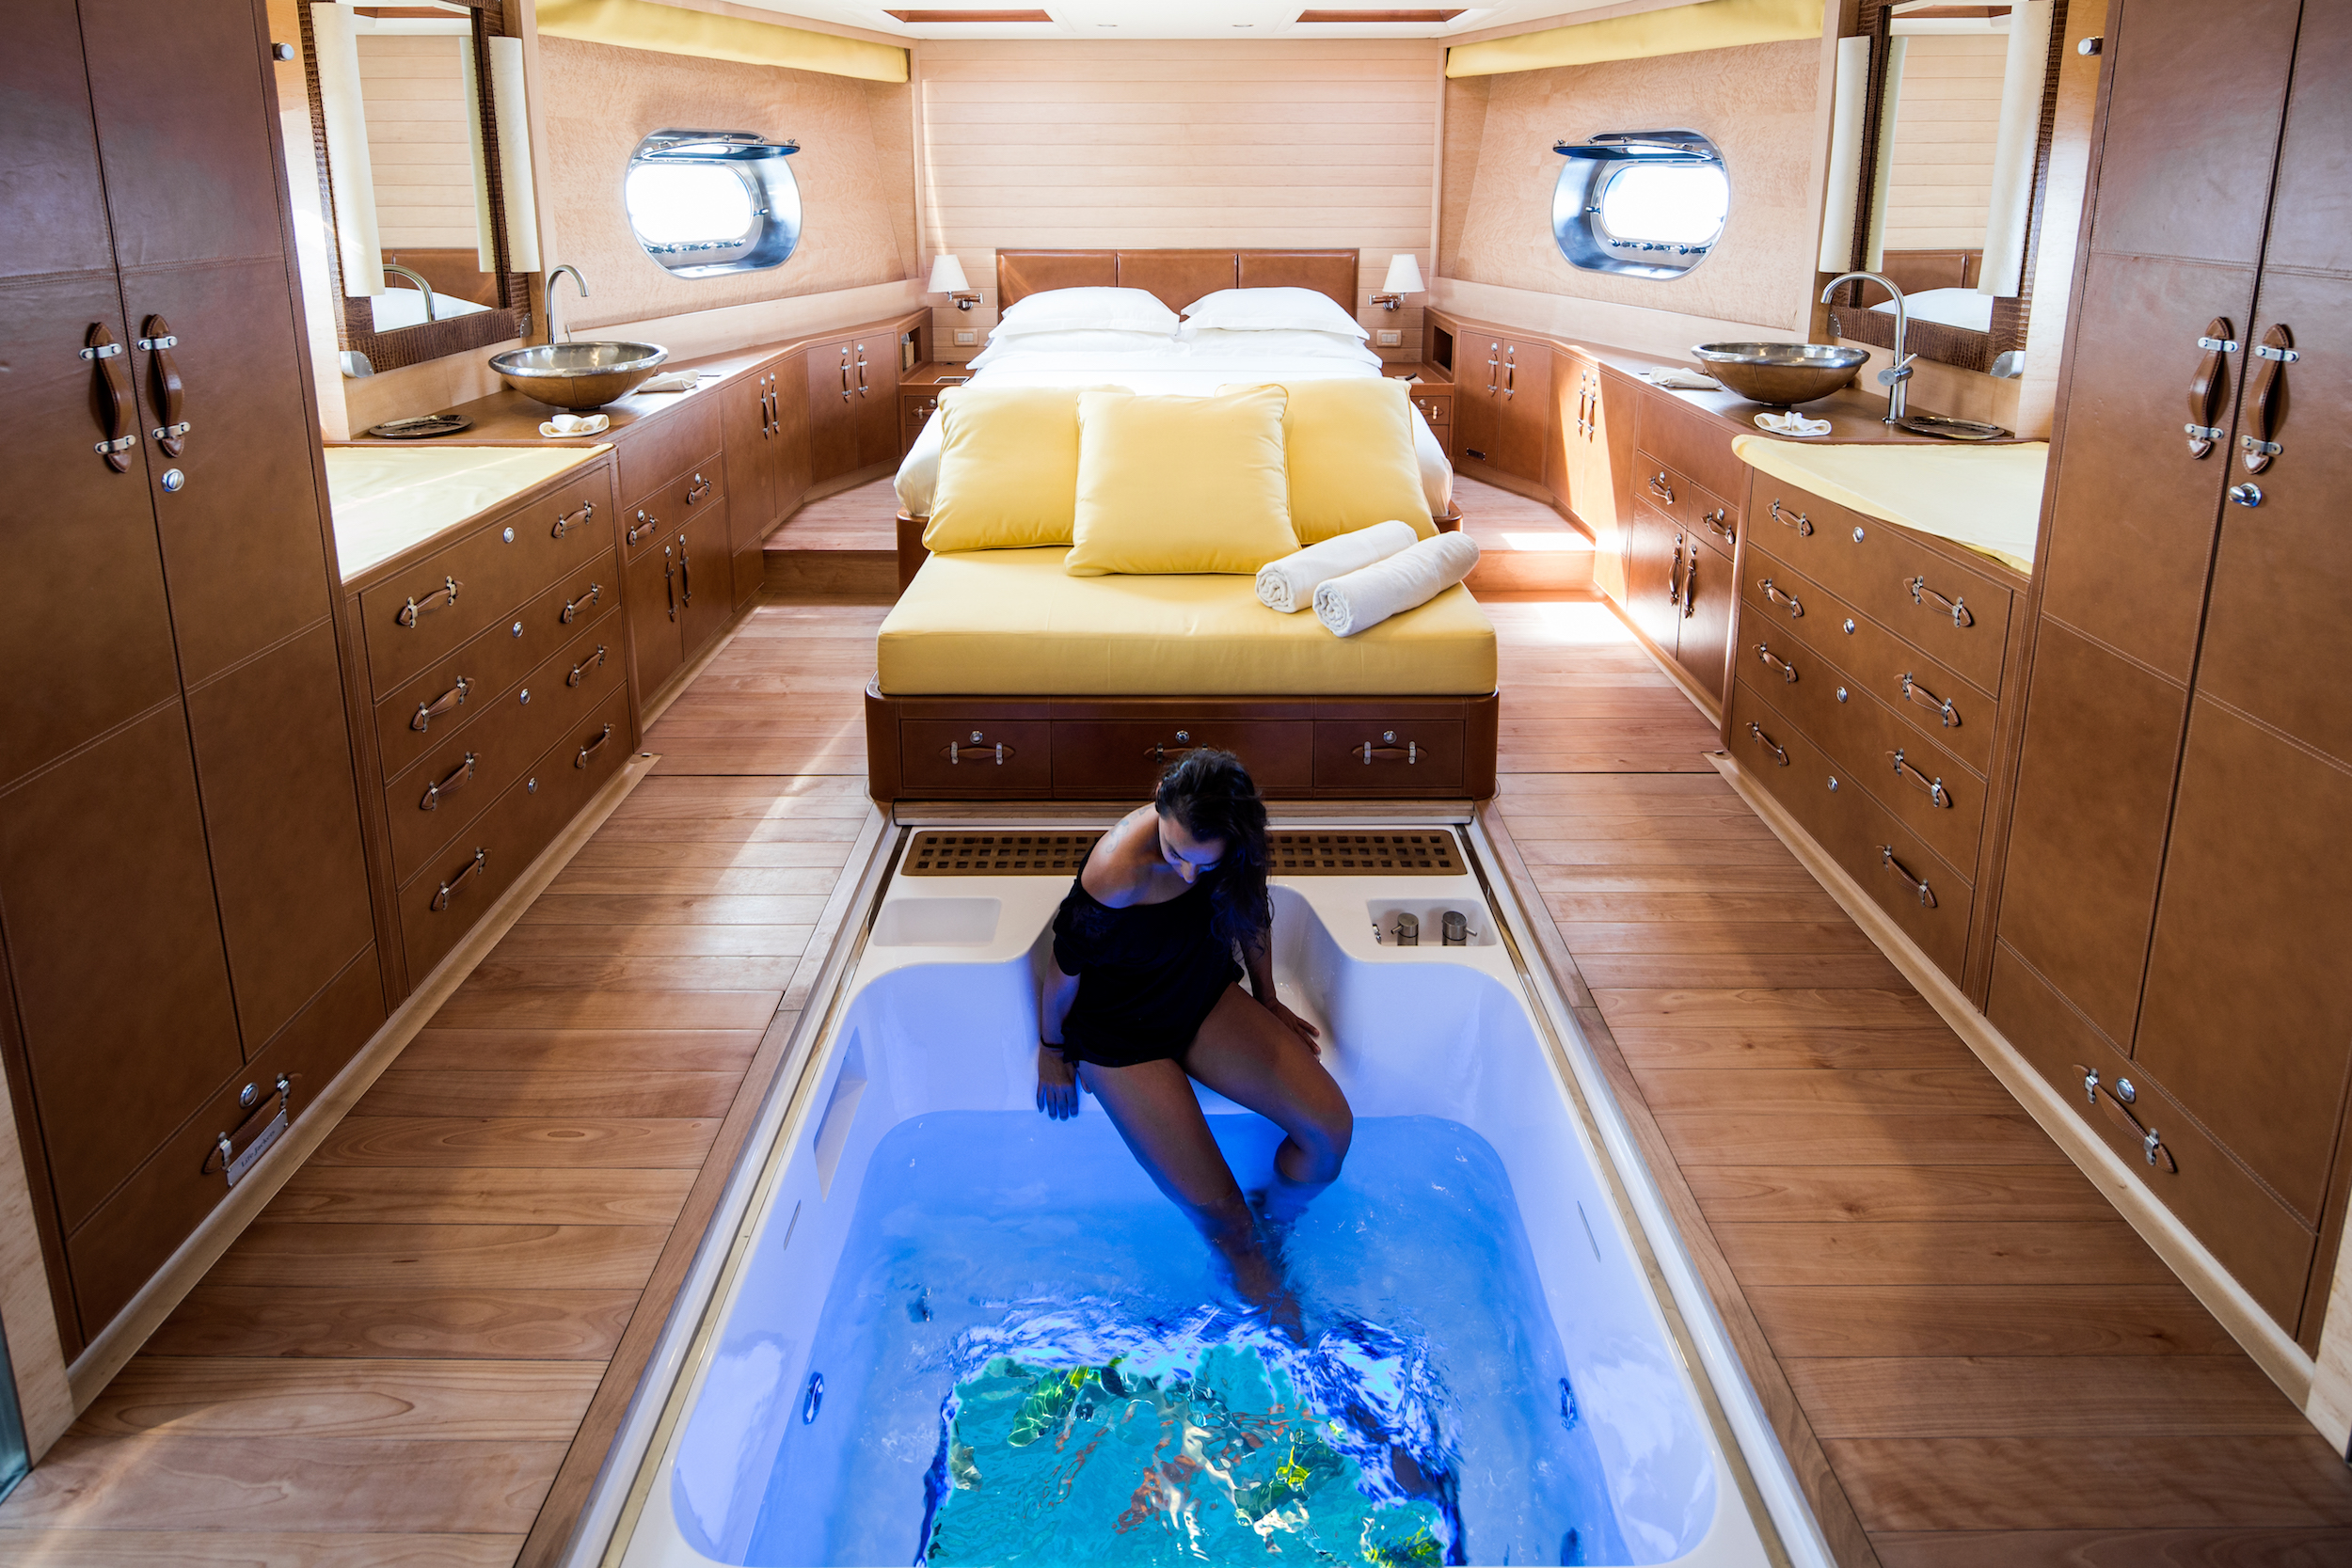 Soneva in Aqua glass bottom spa tub by Richard Waite.jpg